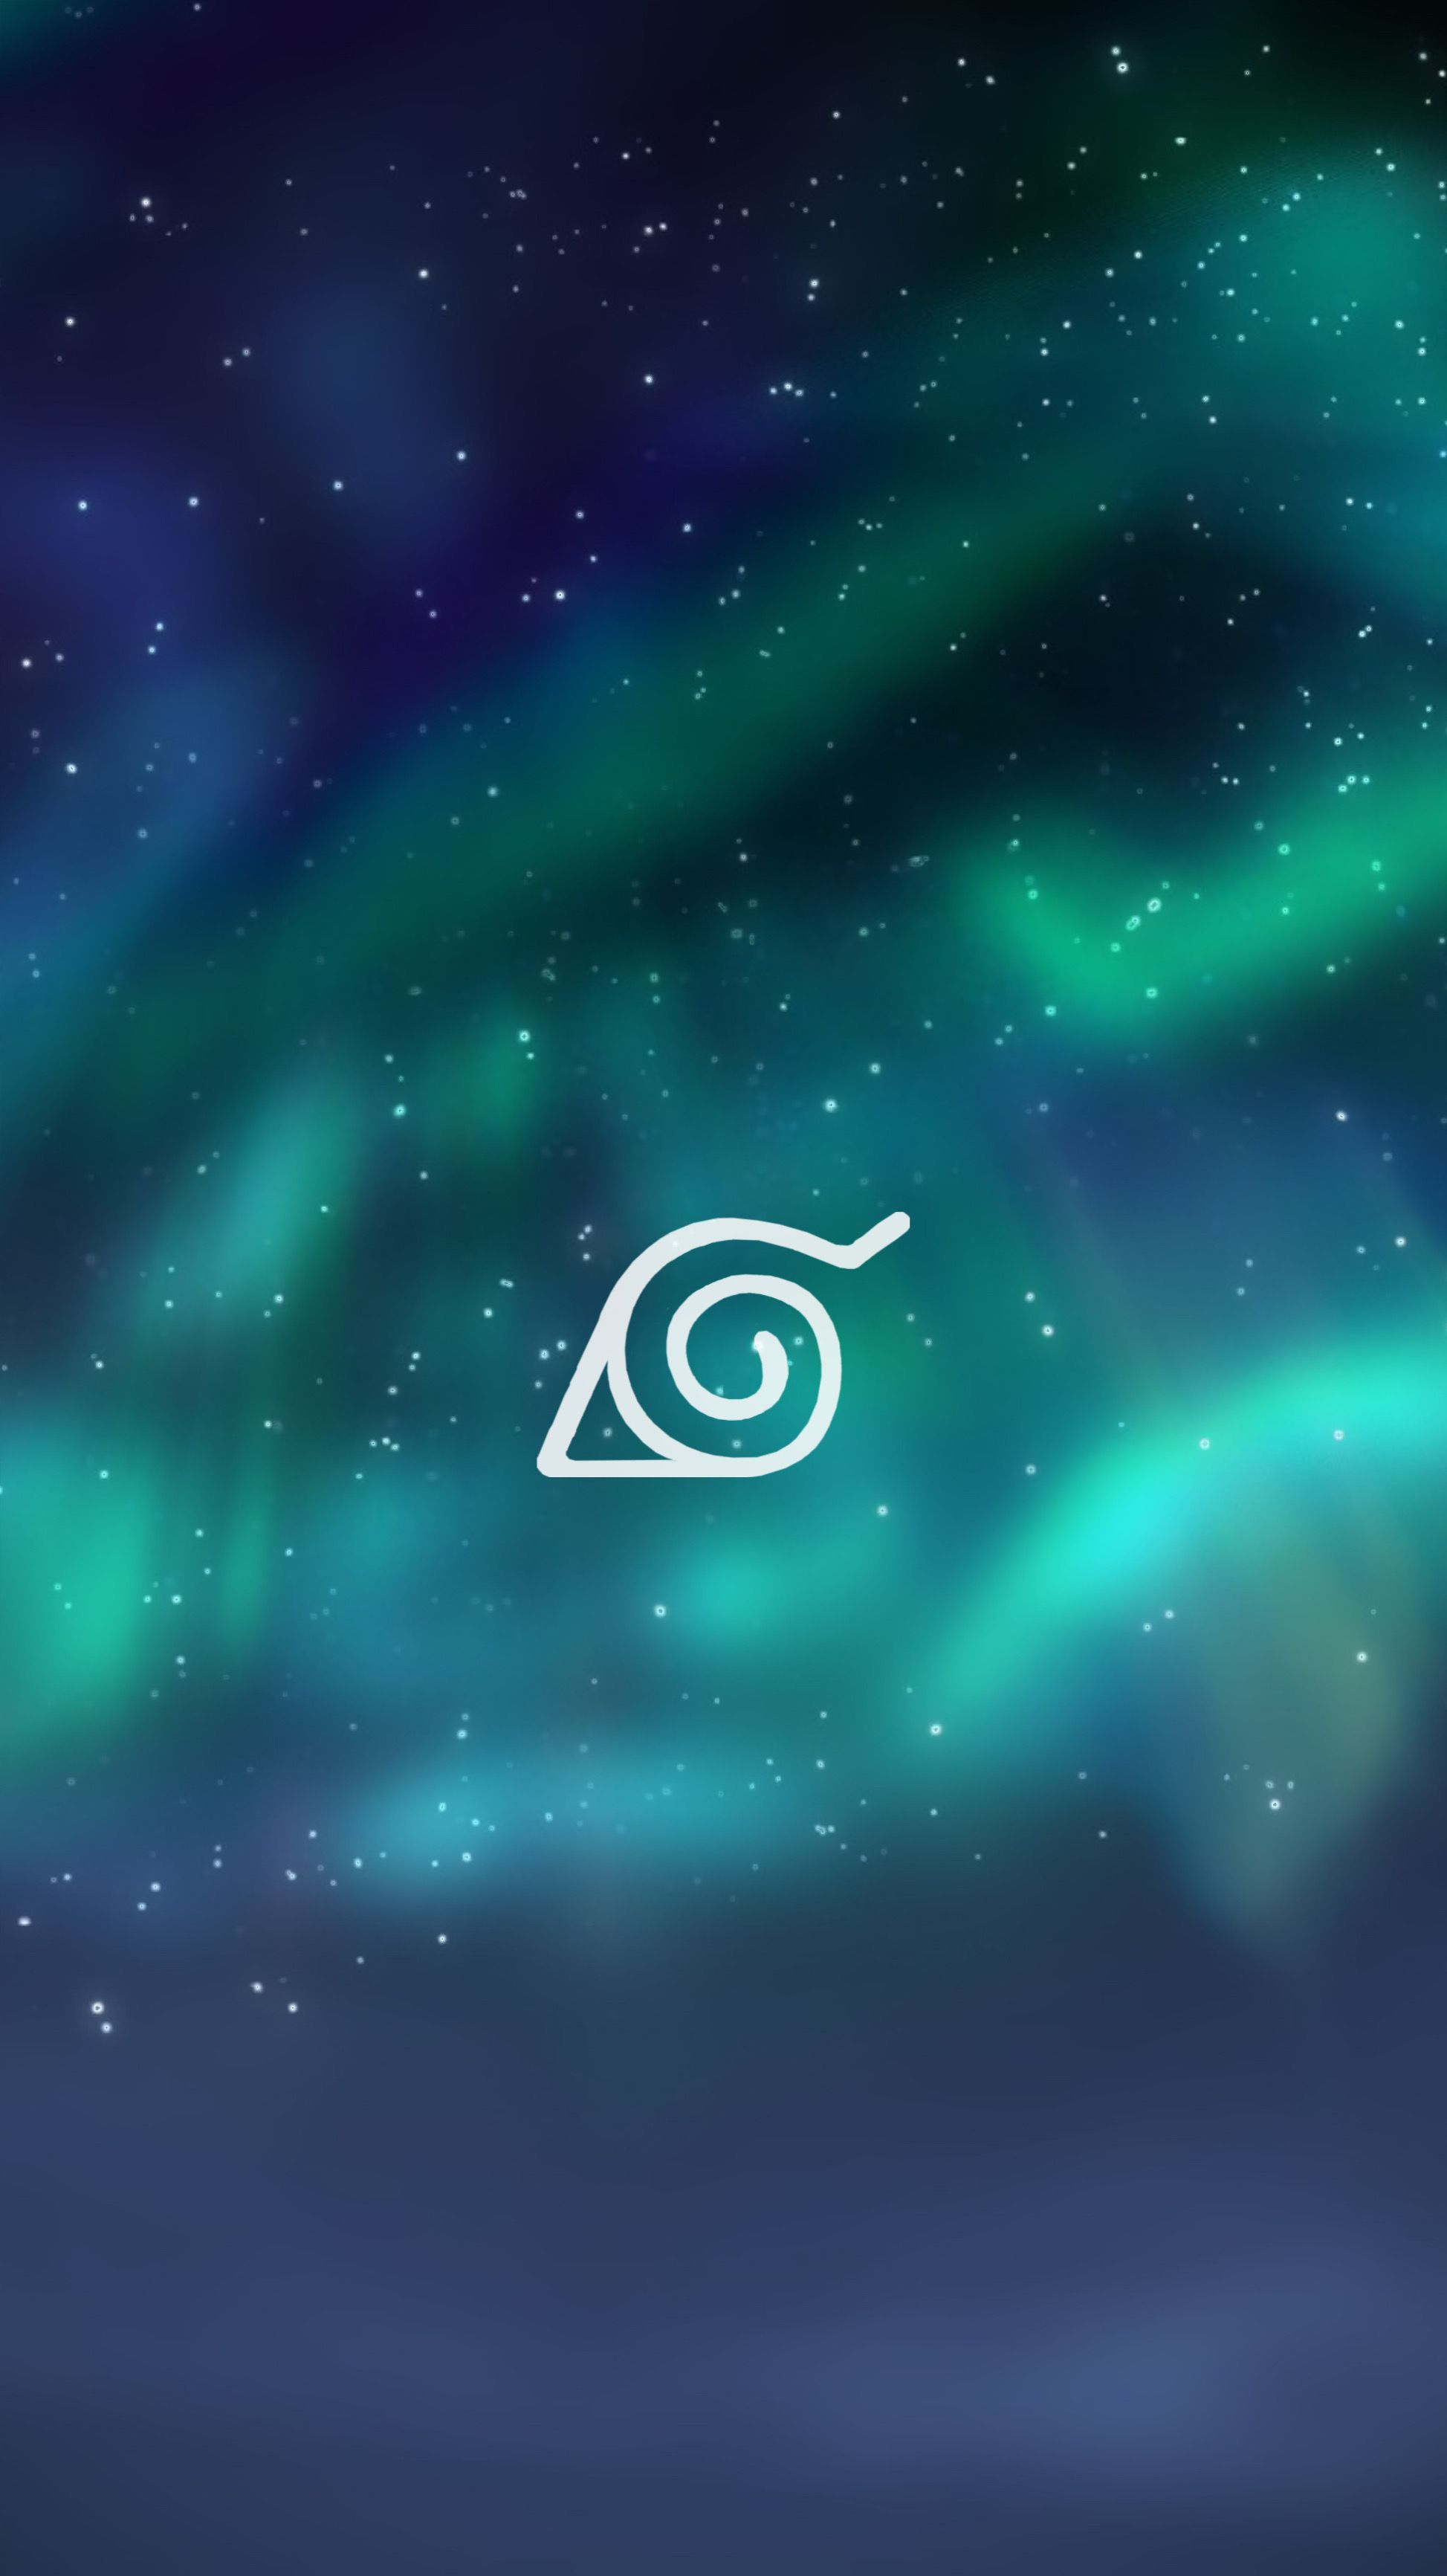 Aesthetic Lockscreen / Wallpaper Naruto in 2020 Naruto